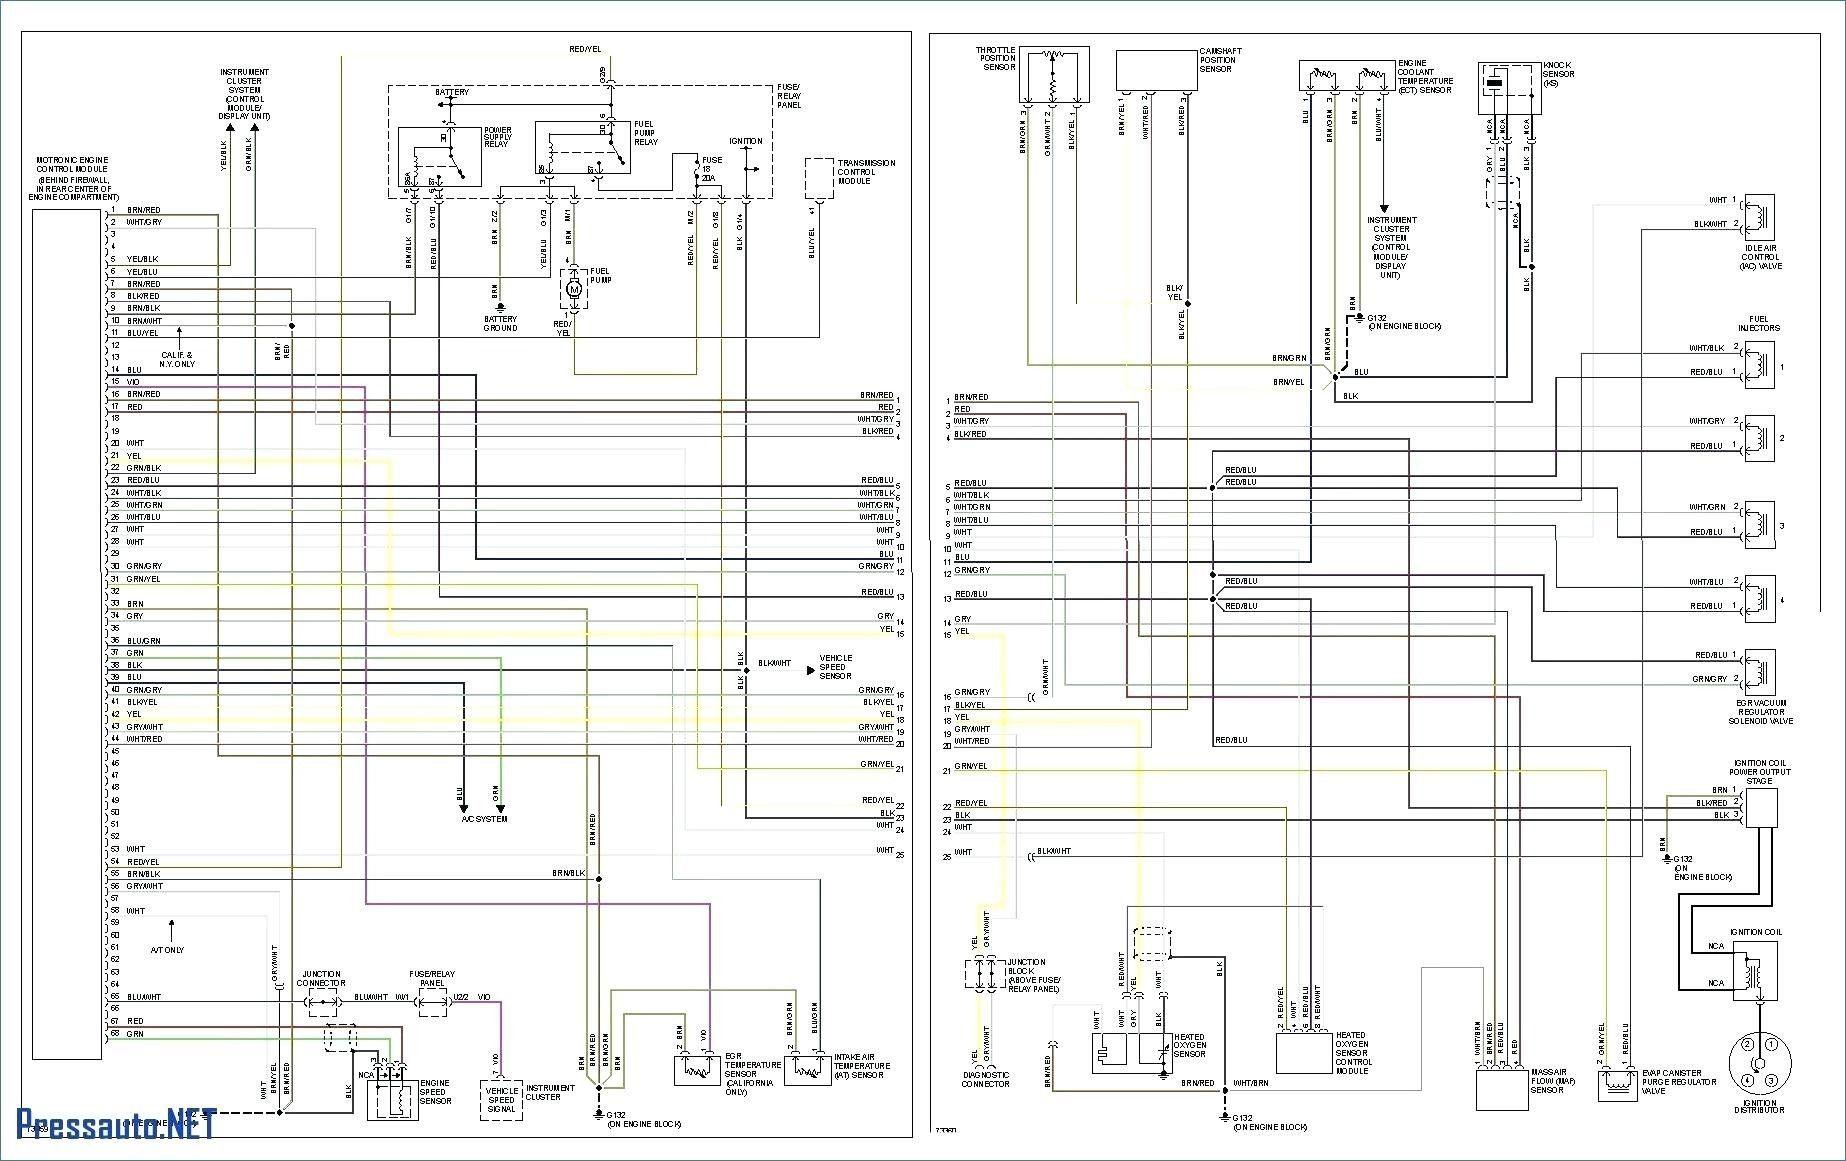 Luxury Wiring Diagram Of An Alternator Diagrams Digramssample Diagramimages Wiringdiagramsample Wiringdiagram Vr6 Engine Vw Up Vw Jetta